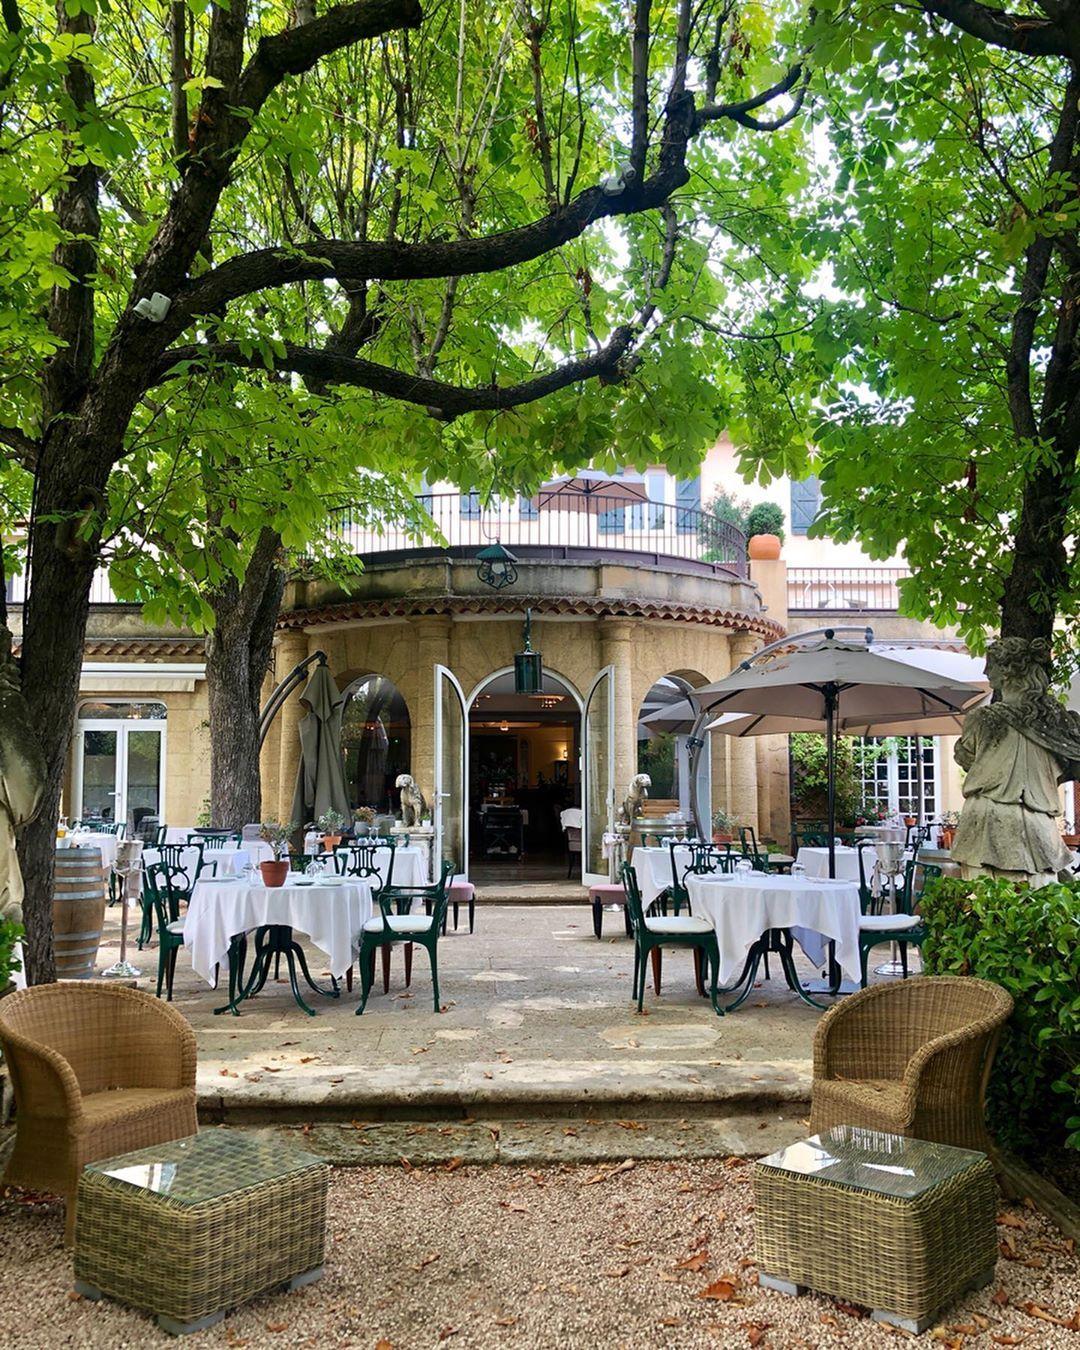 La Table du Pigonnet 🌿- simply charming and always delicious ⬅️swipe @lepigonnet